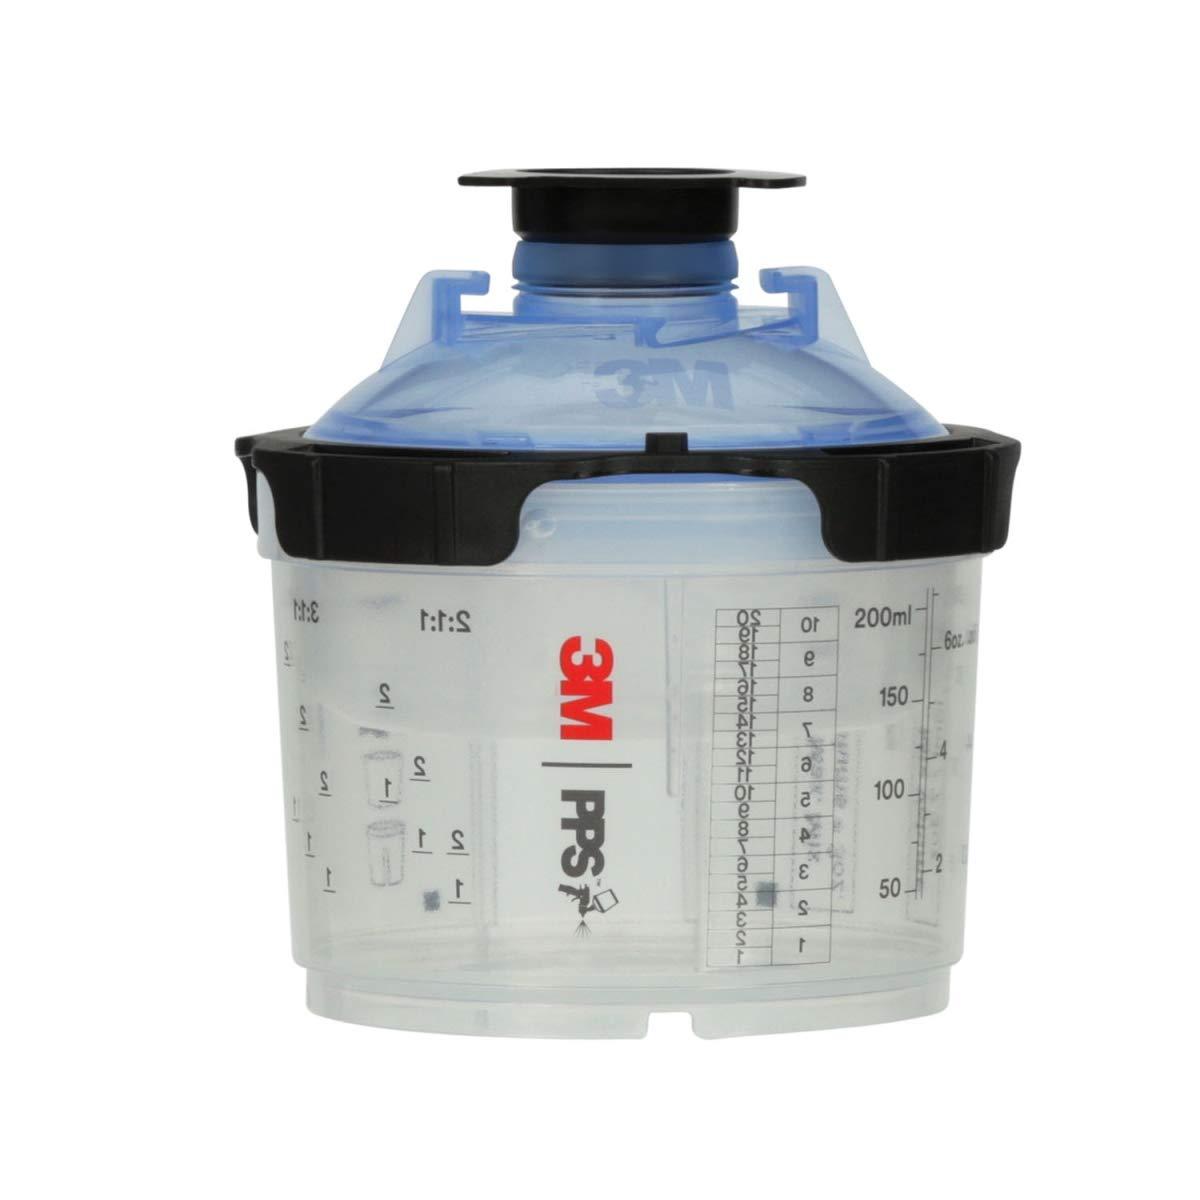 3M 1 kit/cs, PPS Series 2.0 Spray Cup System Kit, Micro (3 fl oz, 90 mL), 125u Micron Filter (2PS-26328)